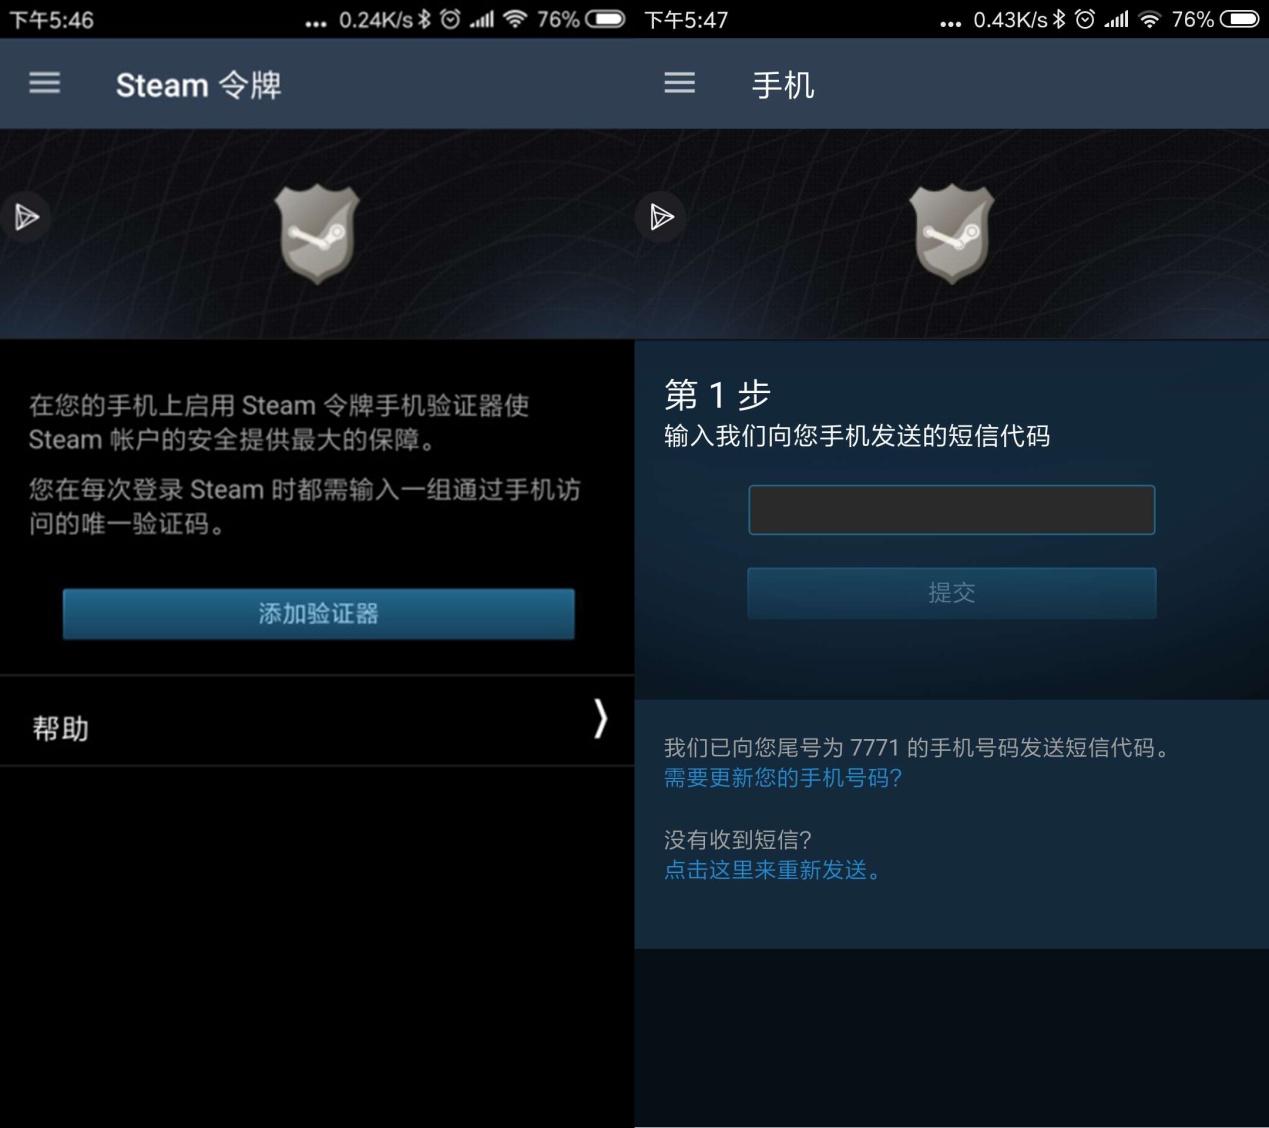 Steam手机版令牌,让游戏生活更方便、安全(Android) 图片5